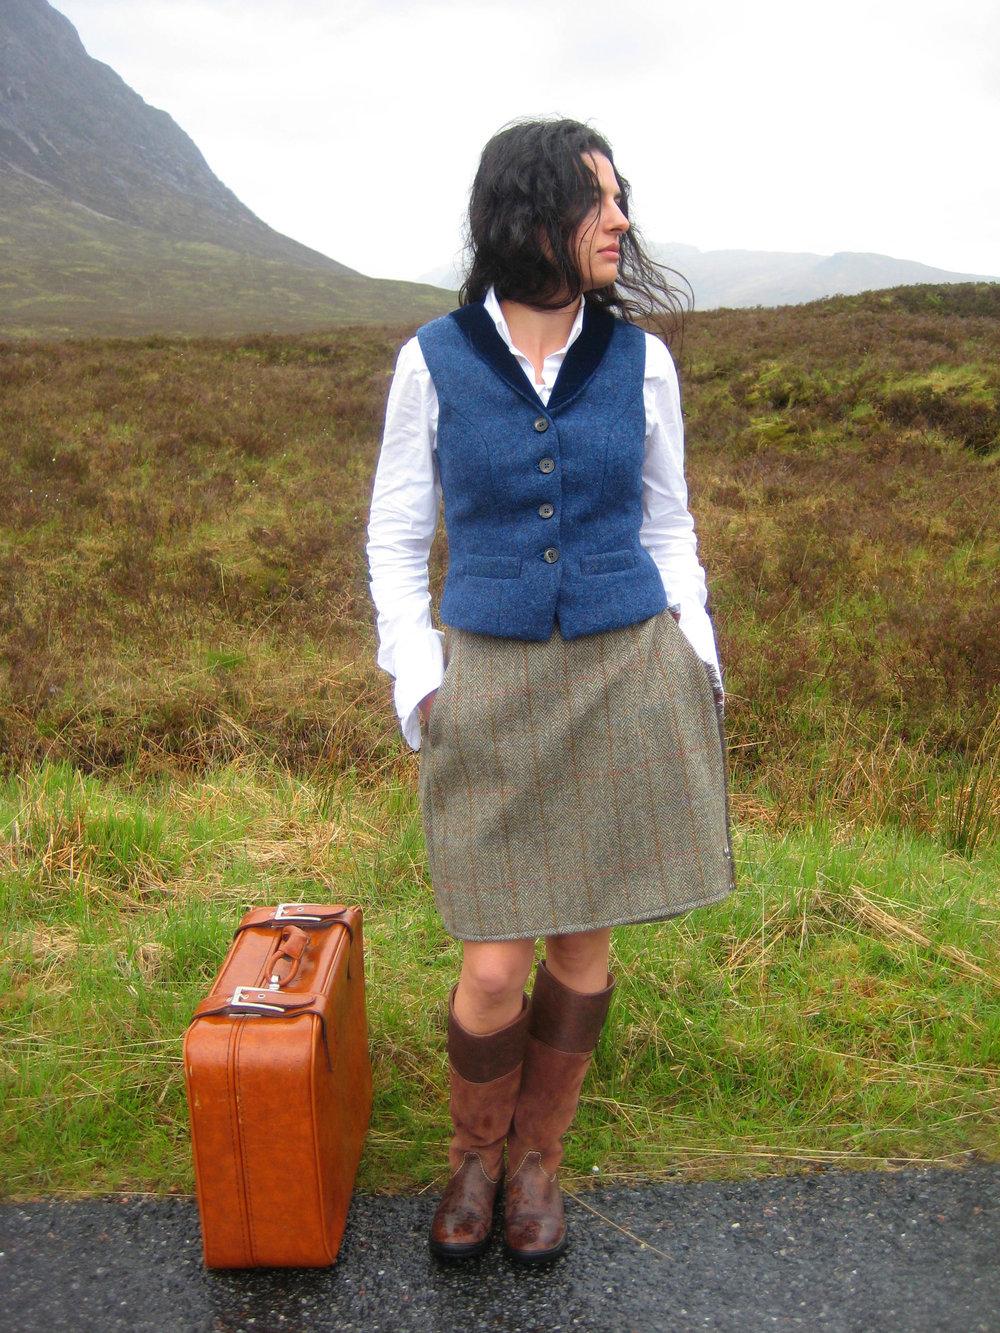 lisa suitcase1.jpg